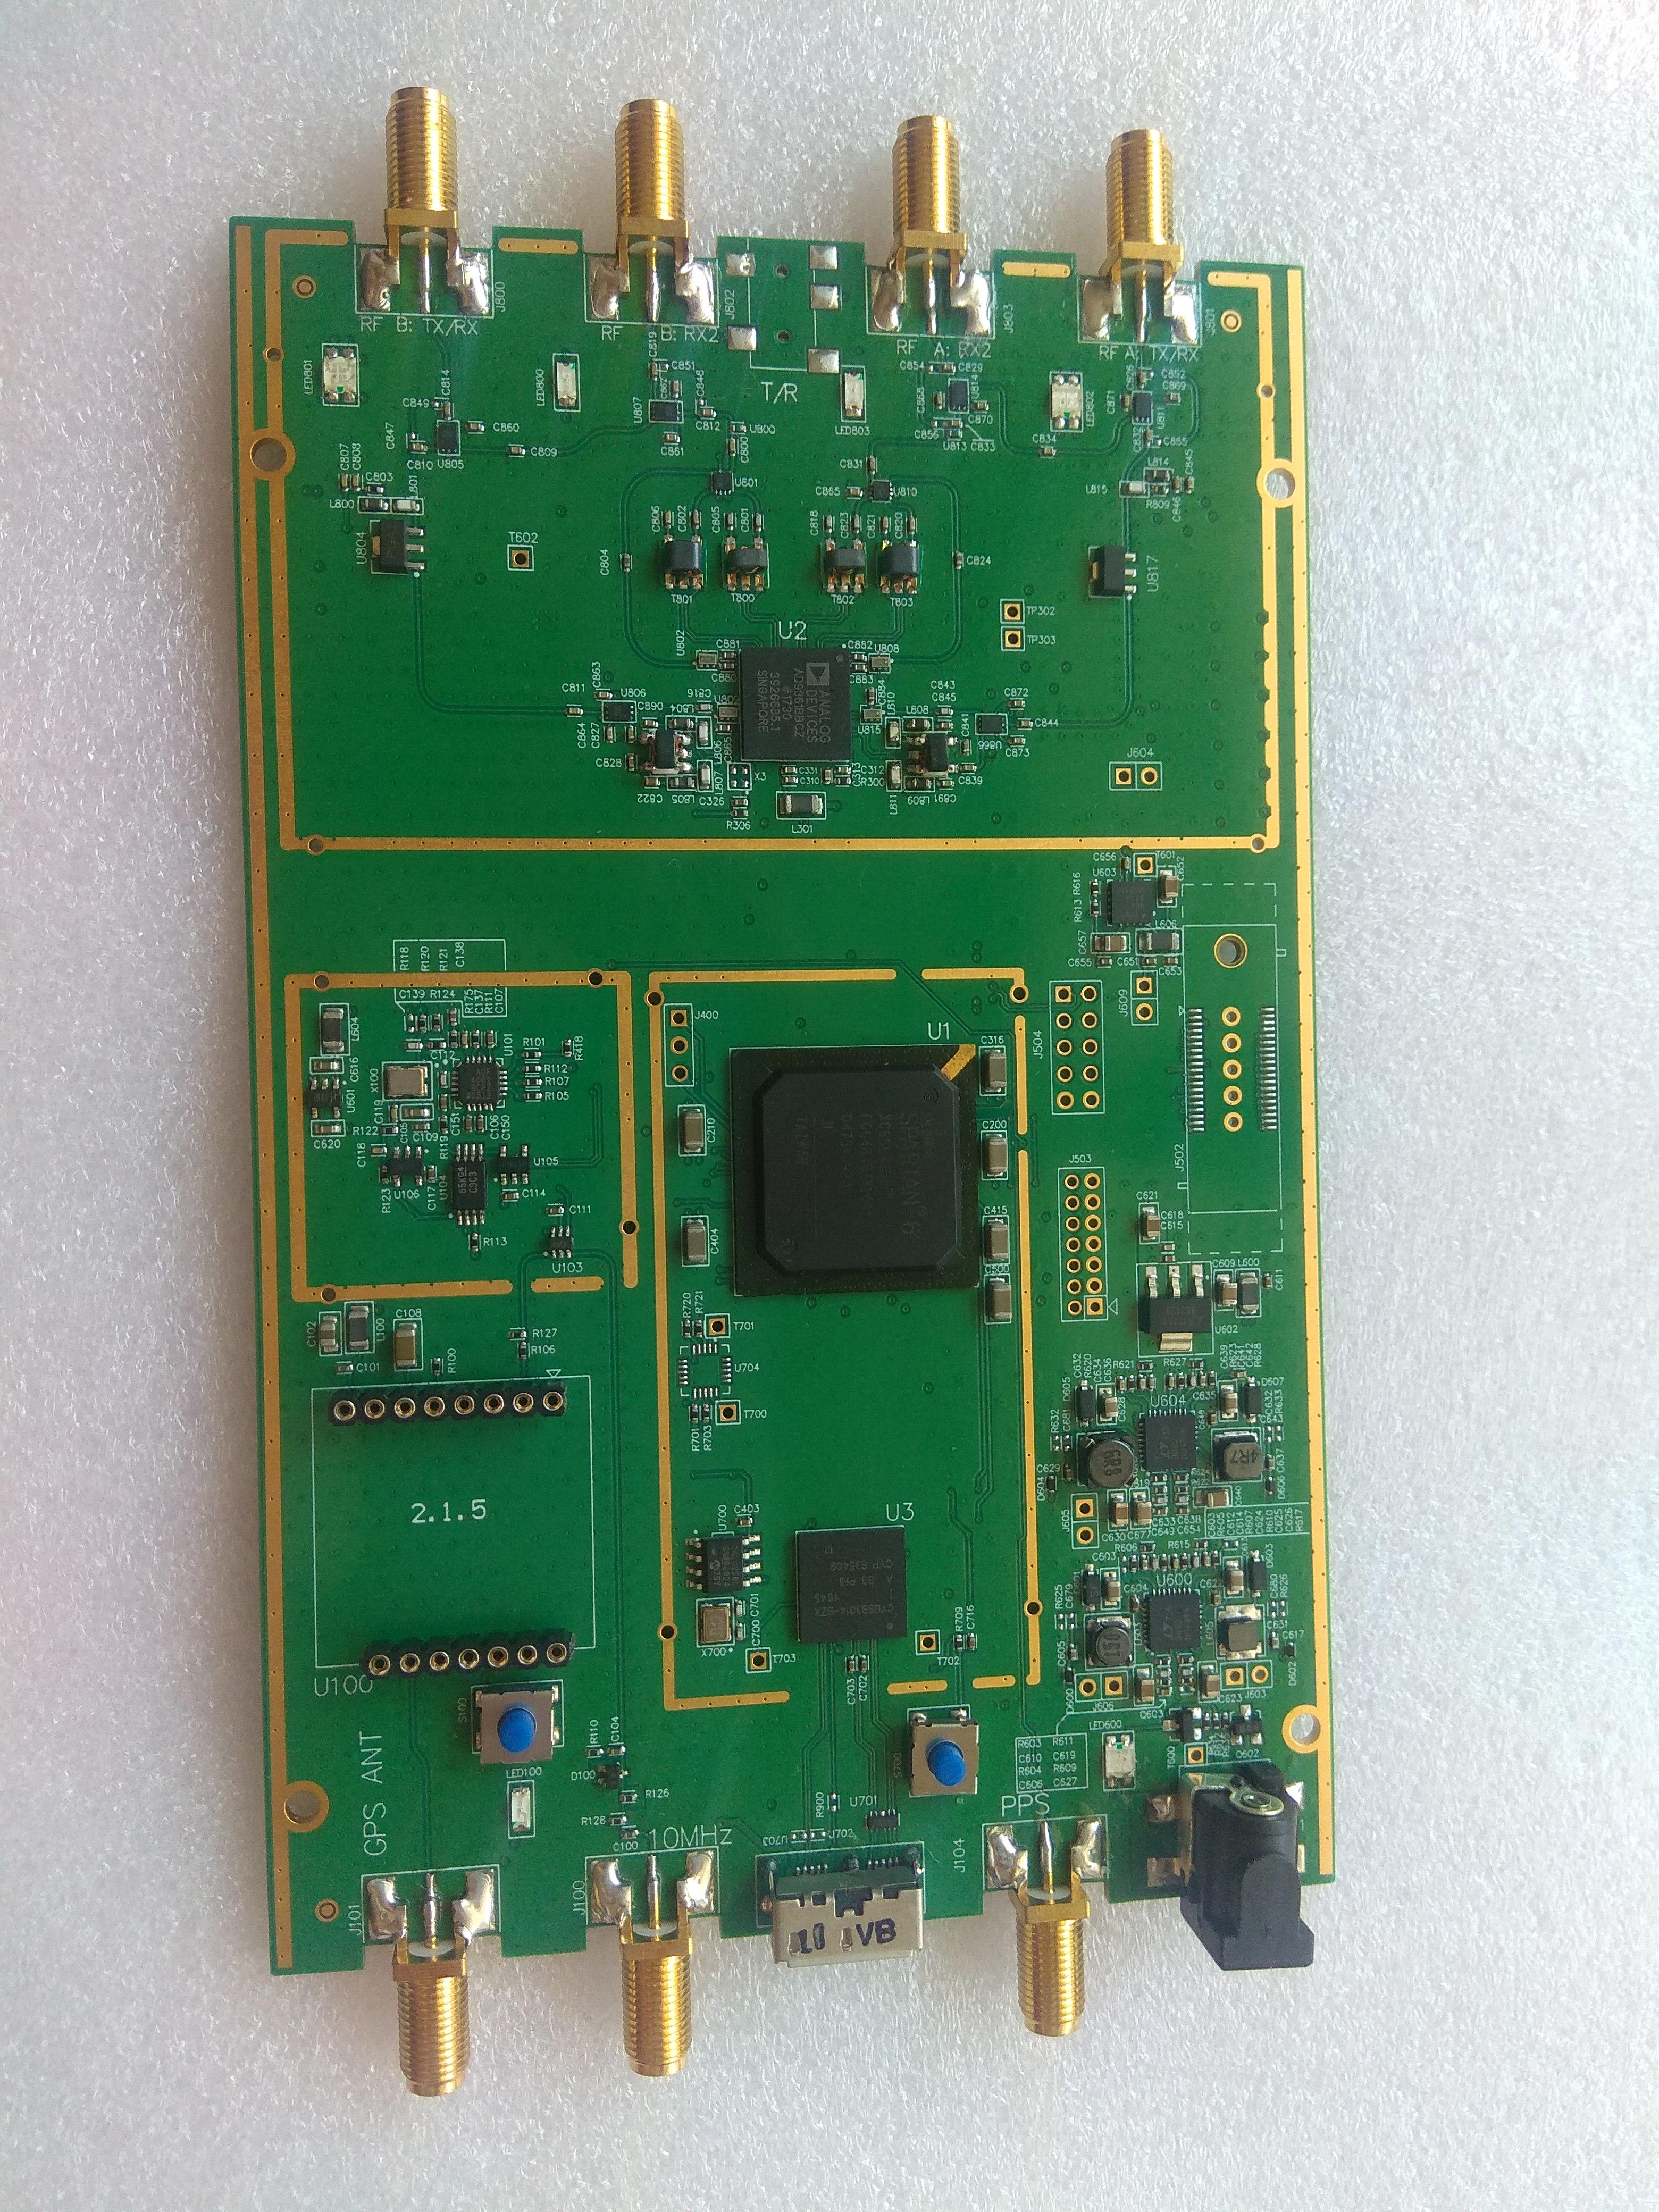 Discuss-gnuradio] usrp b210 compatible sdr